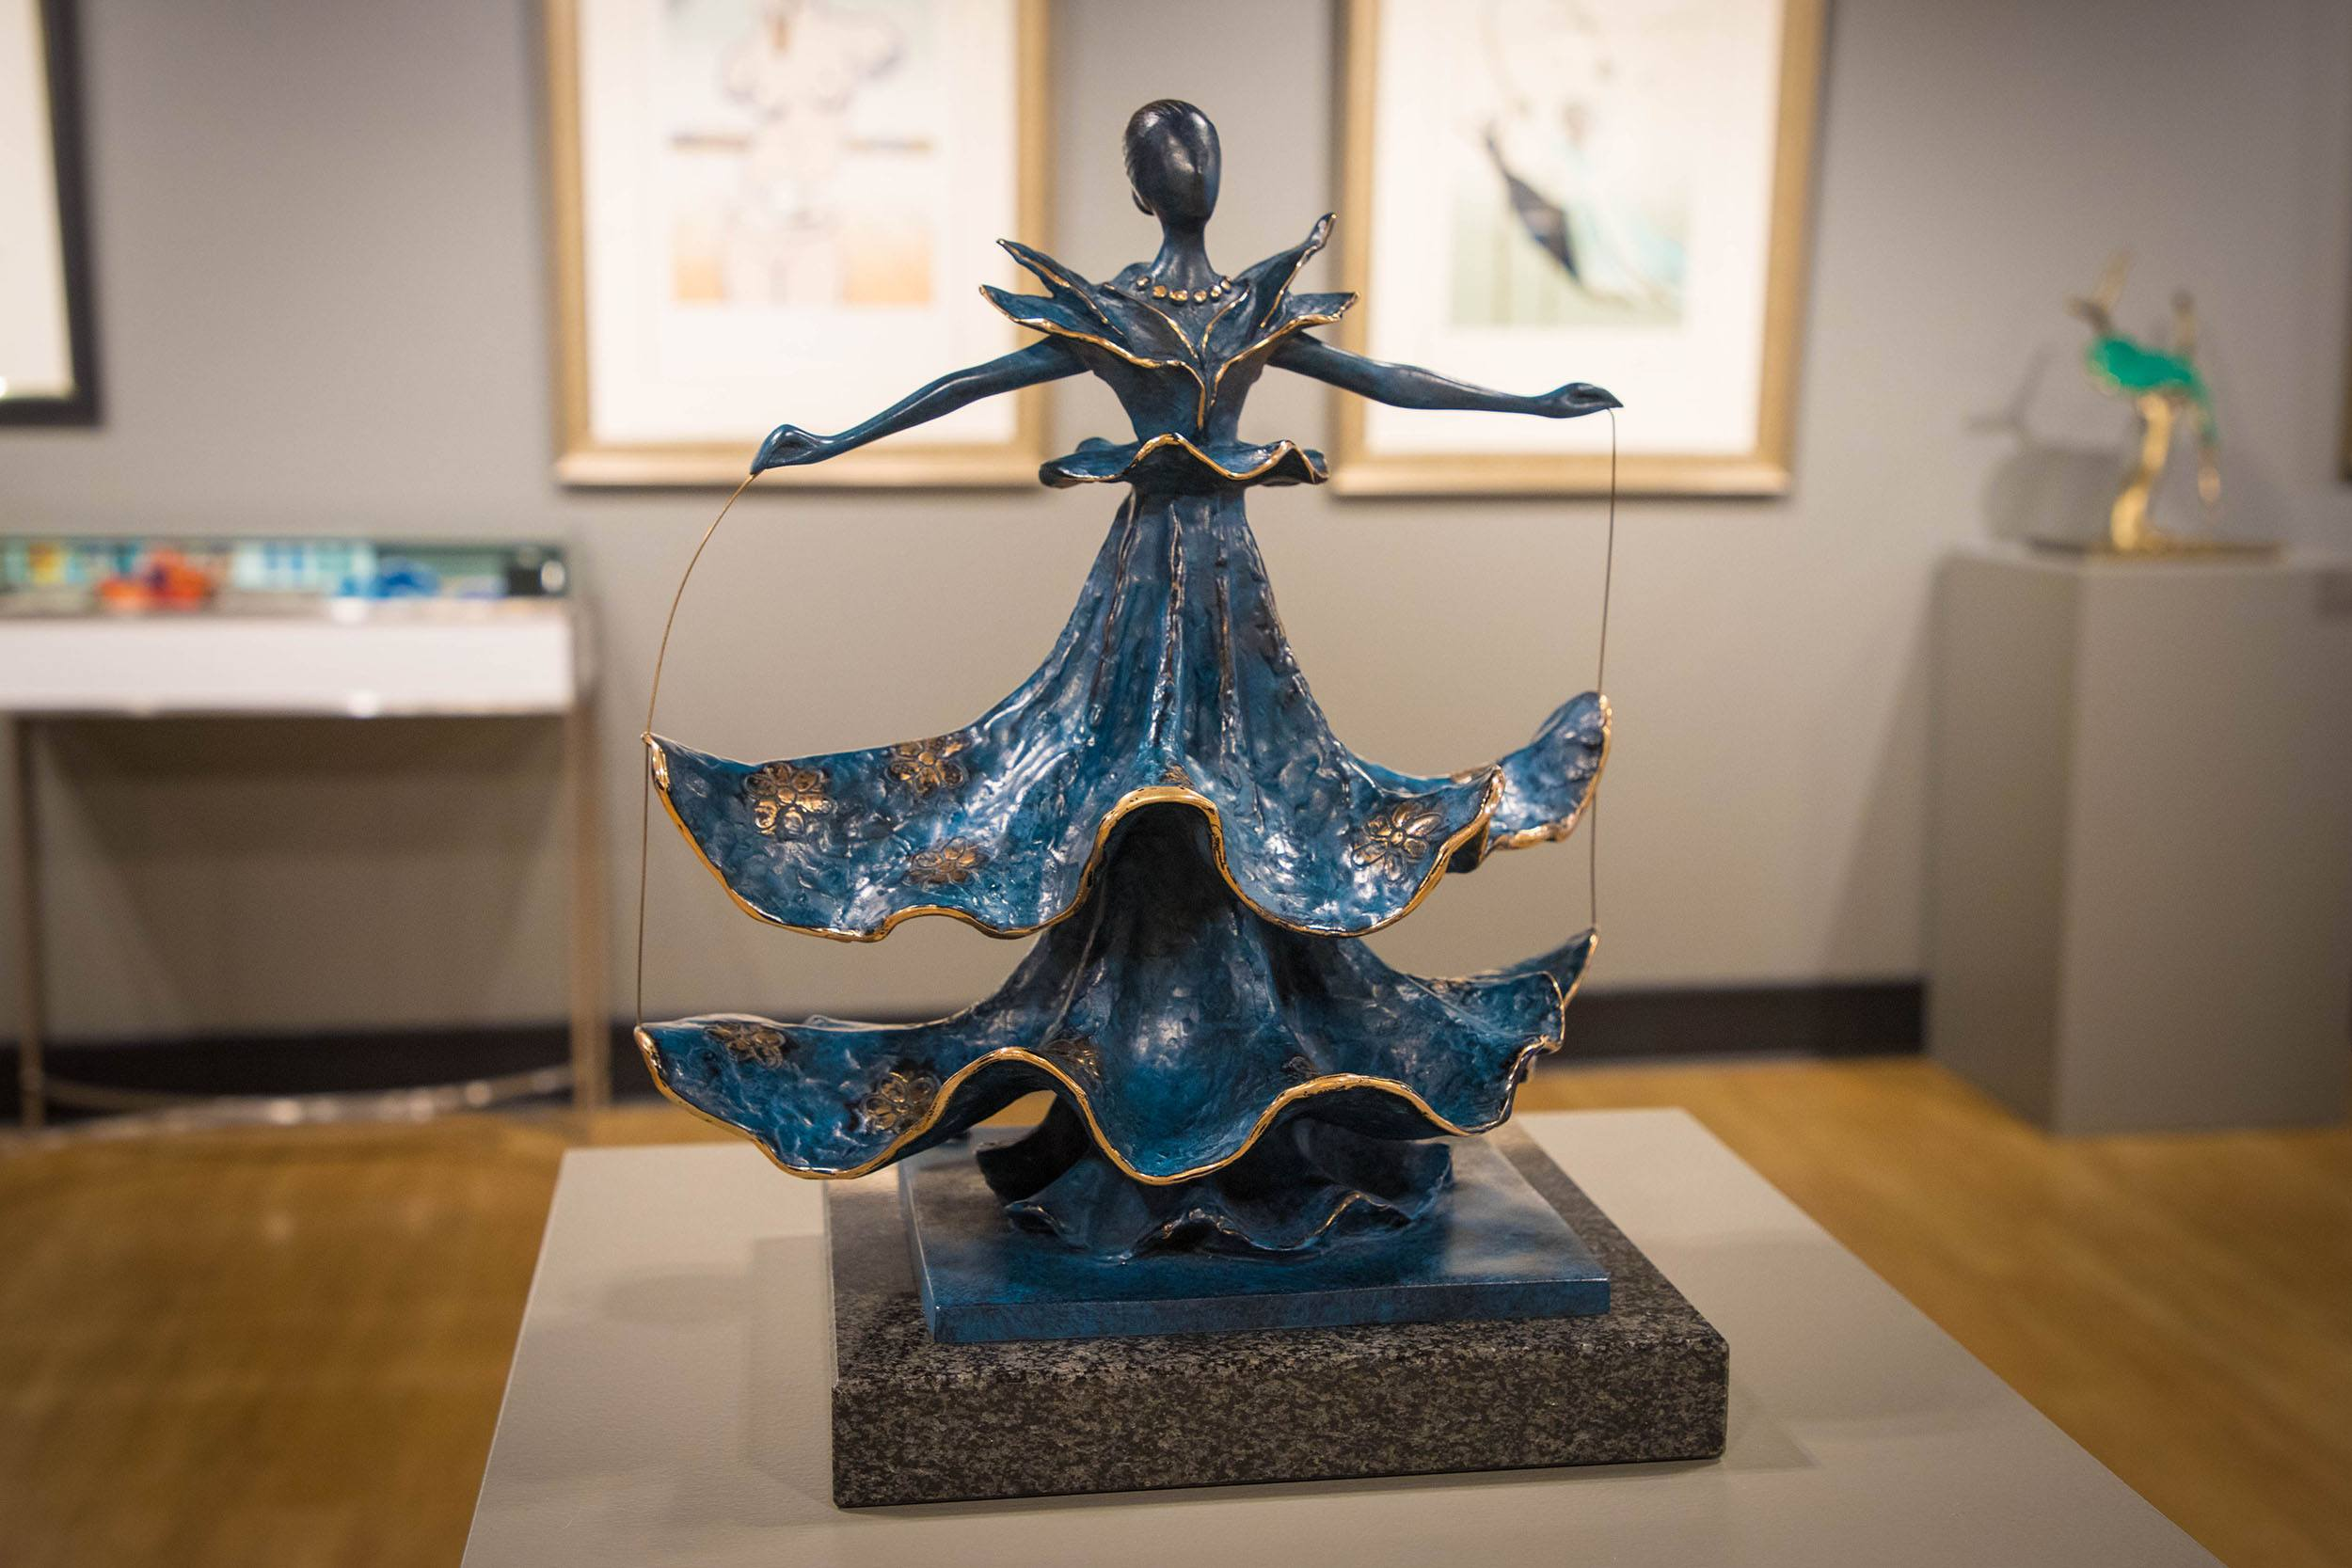 Dalinian Dancer sculpture by Salvador Dalí (Jenni Sheppard/Daily Hive)